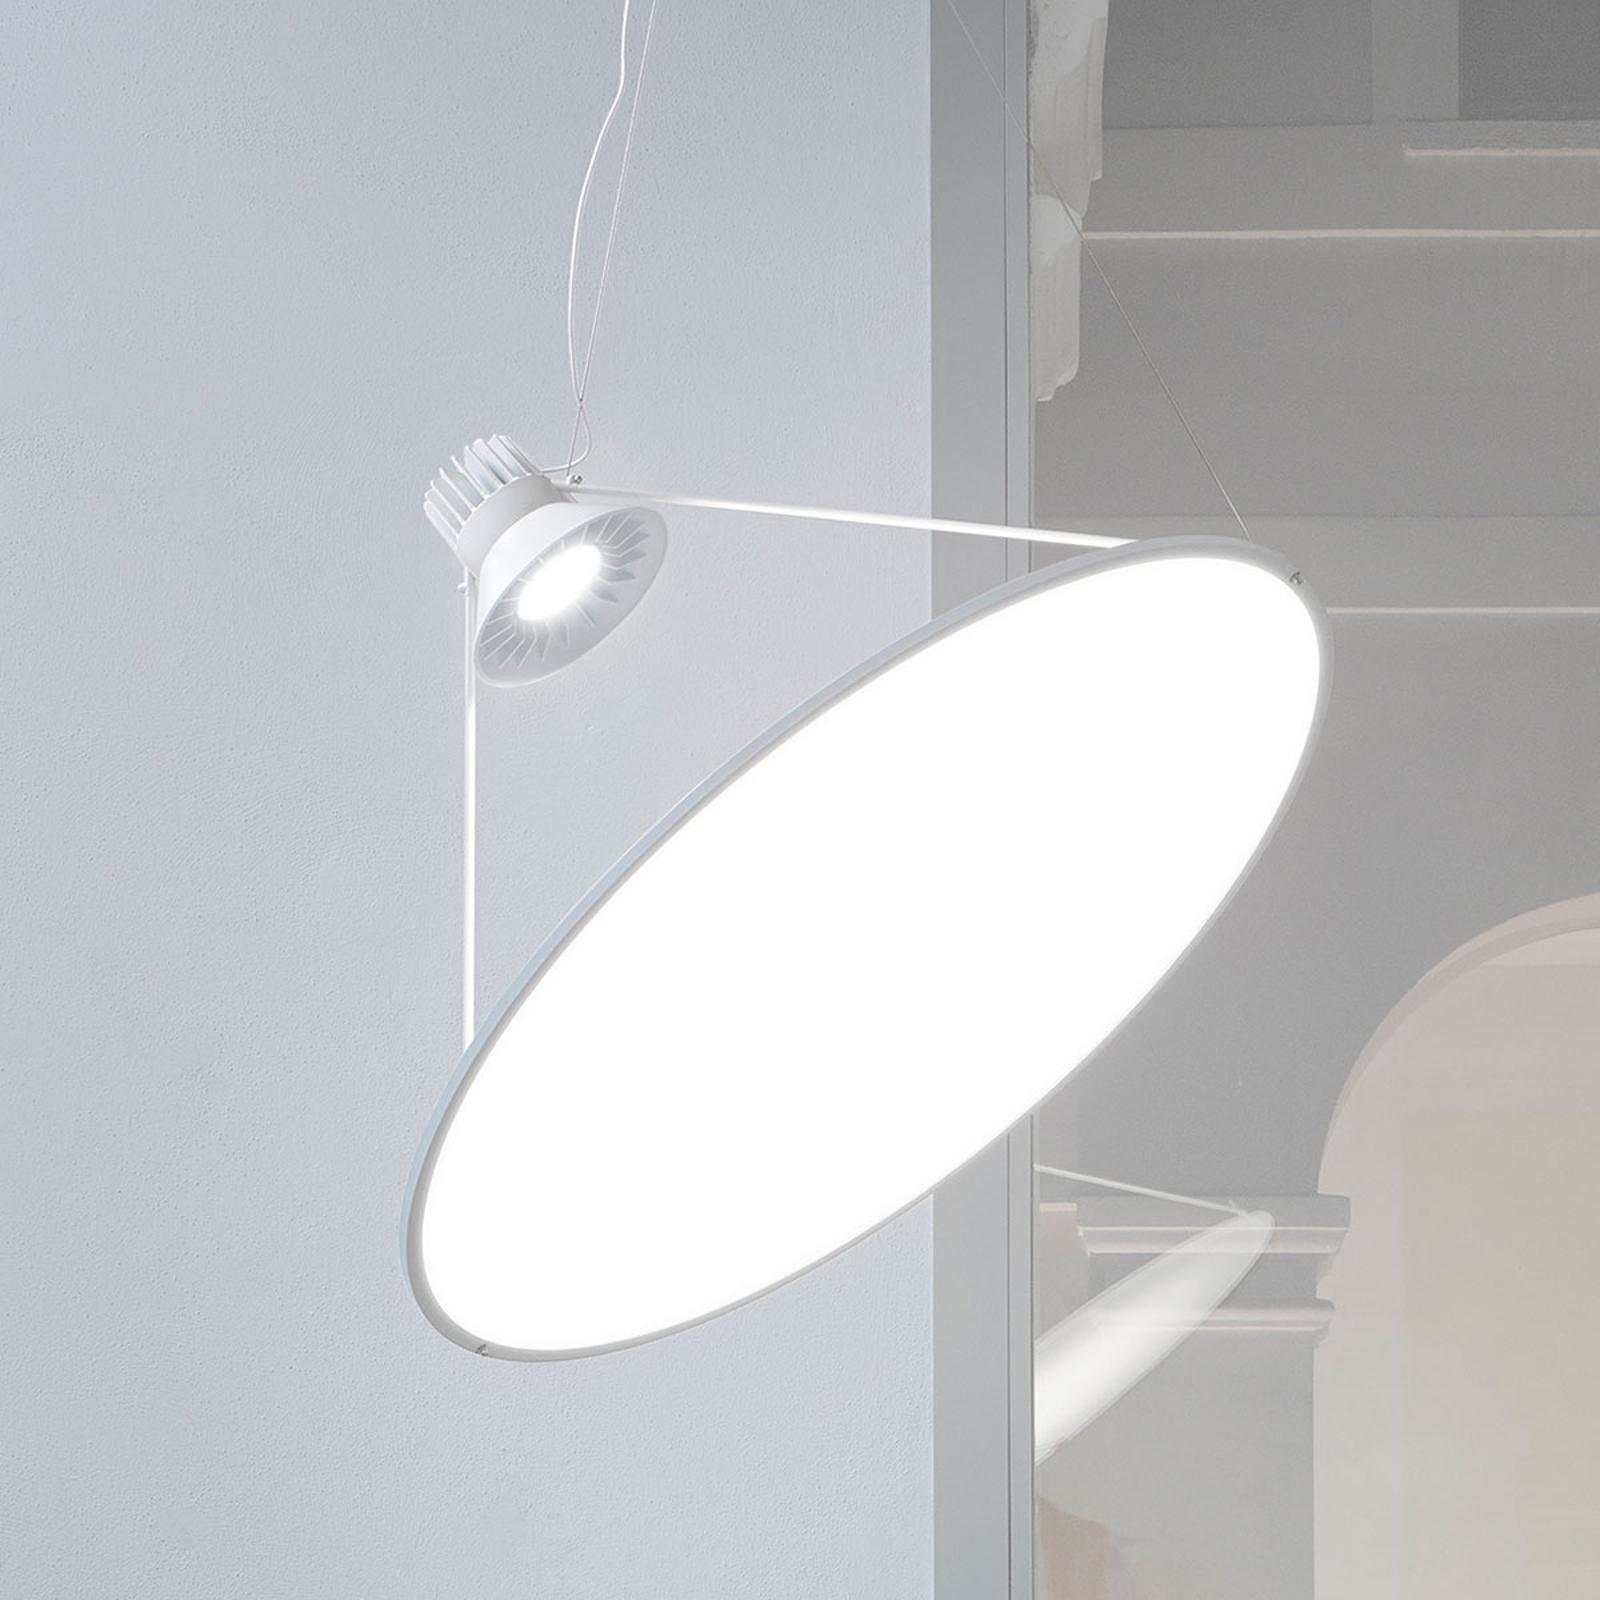 Luceplan Amisol LED-Pendelleuchte Ø 75cm opalweiß